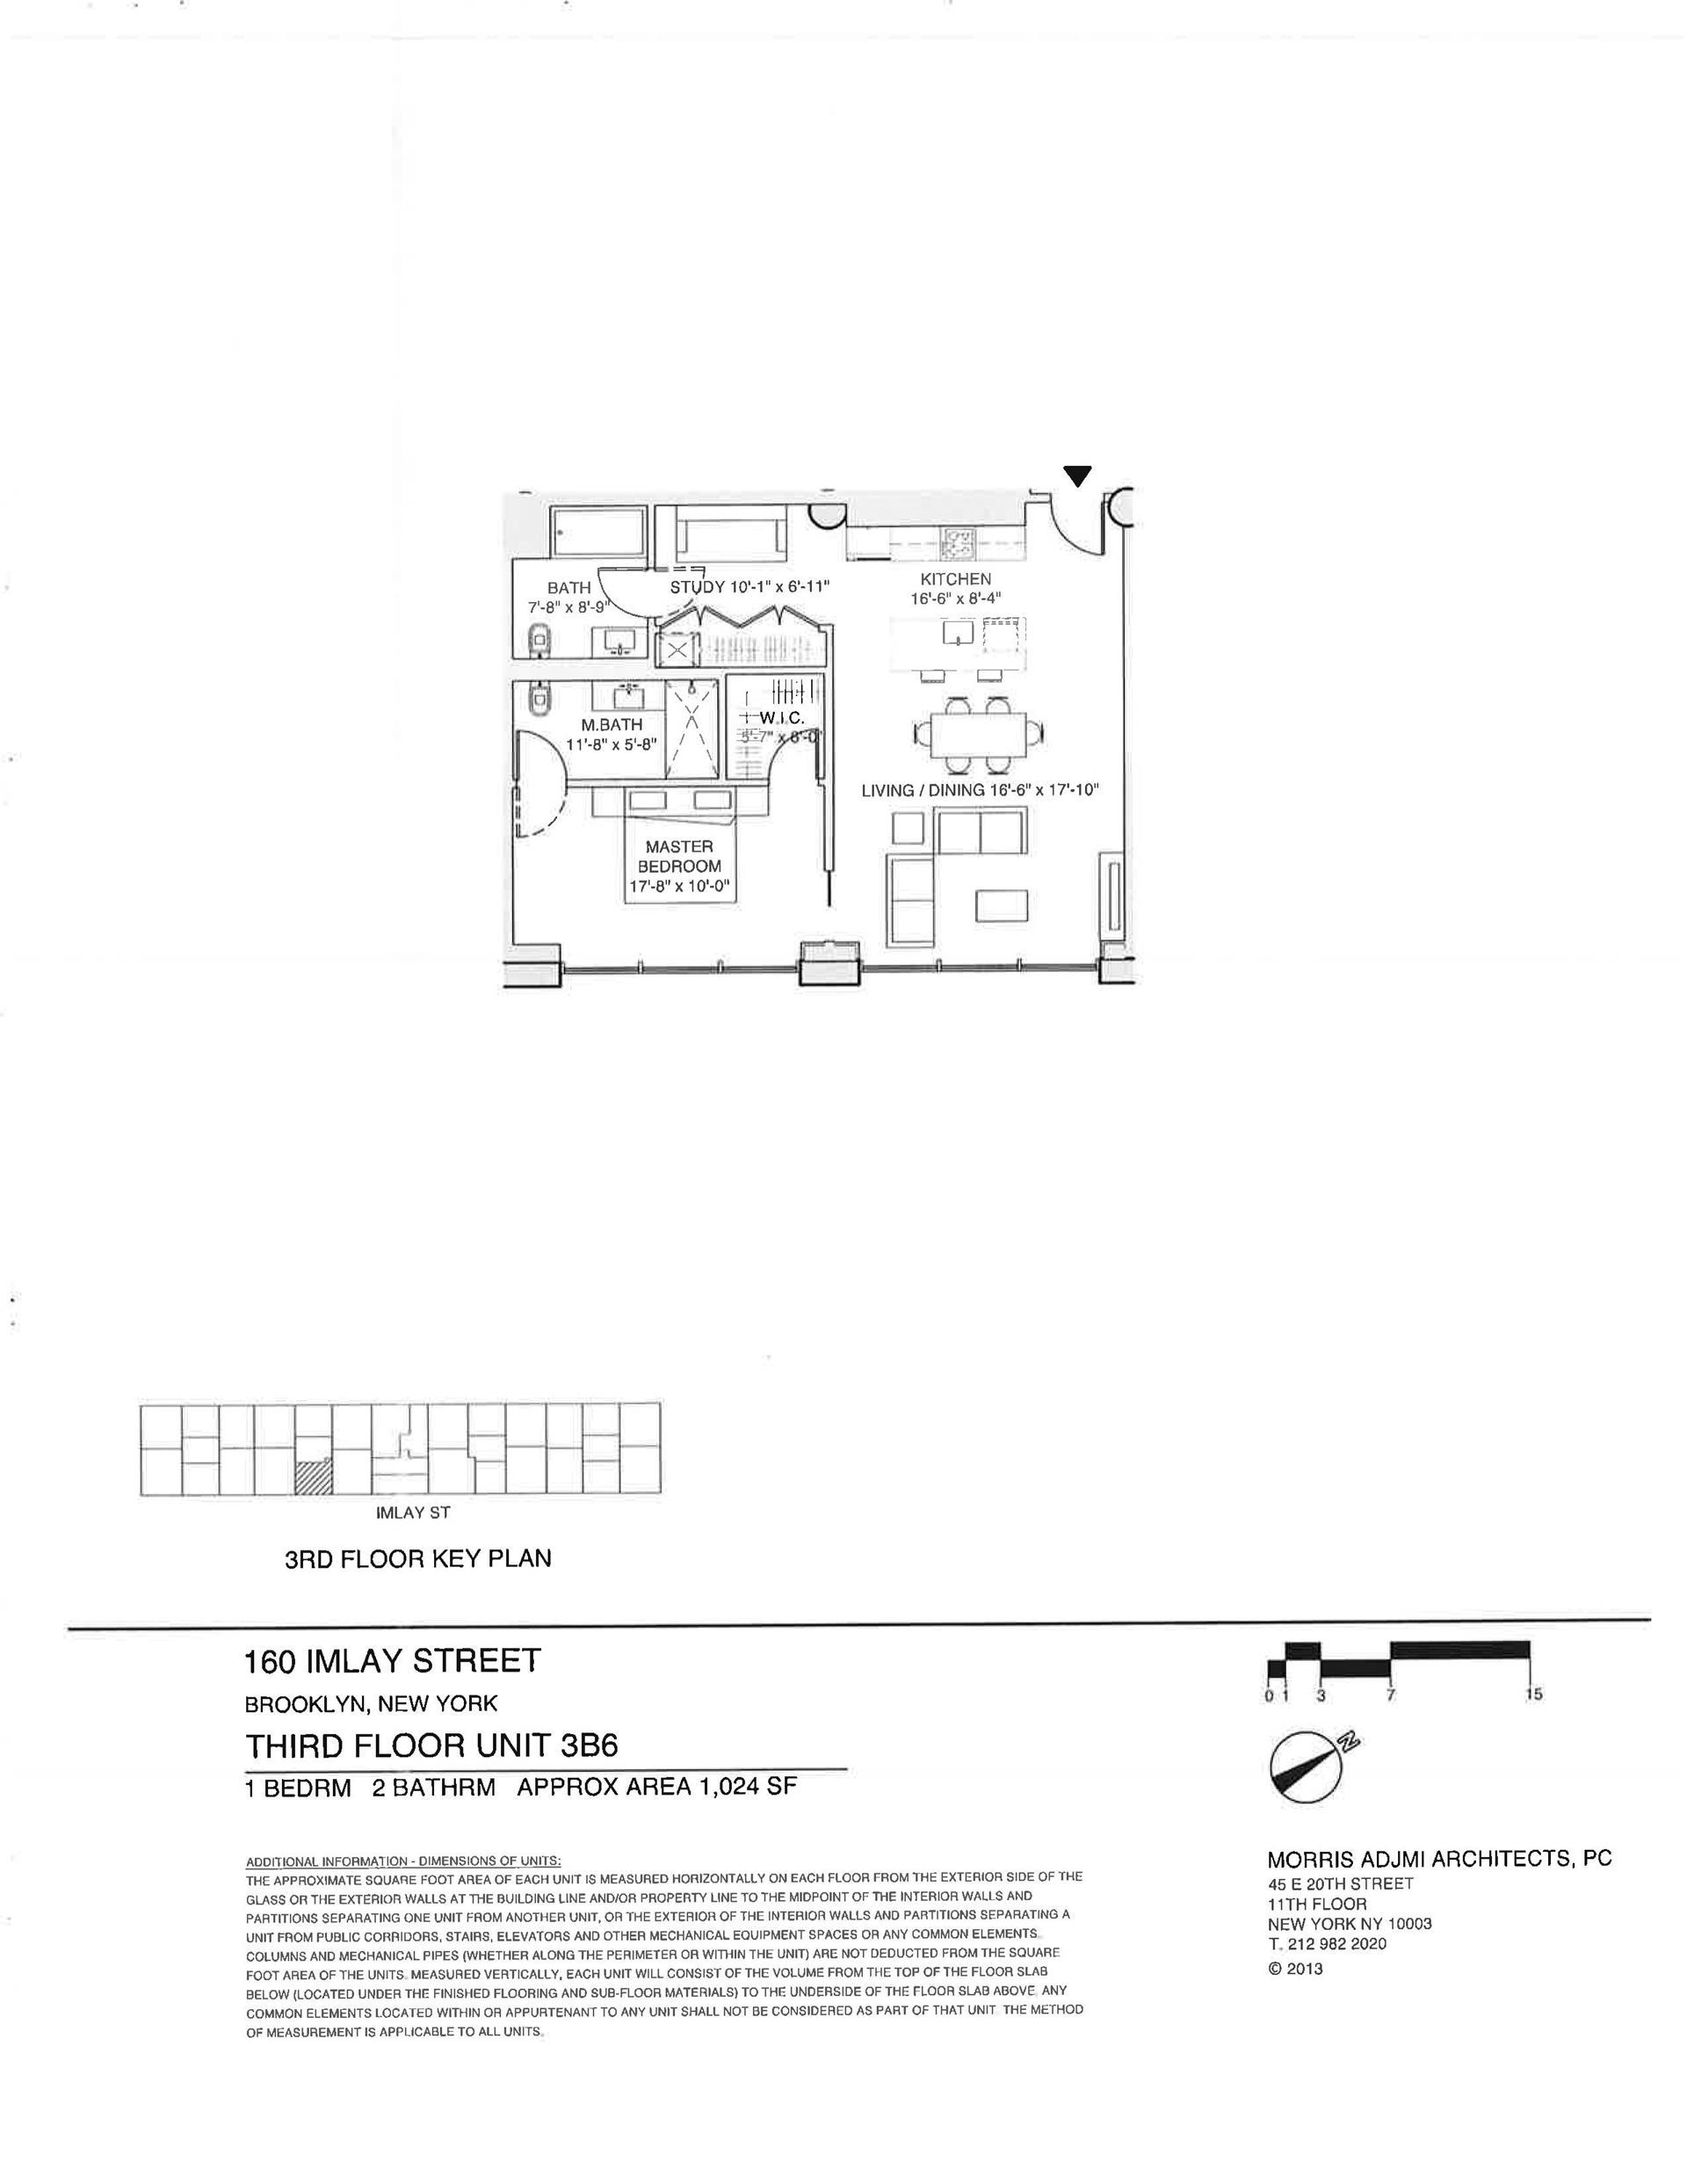 Floor plan of The New York Dock Building, 160 Imlay St, 3B6 - Red Hook, New York